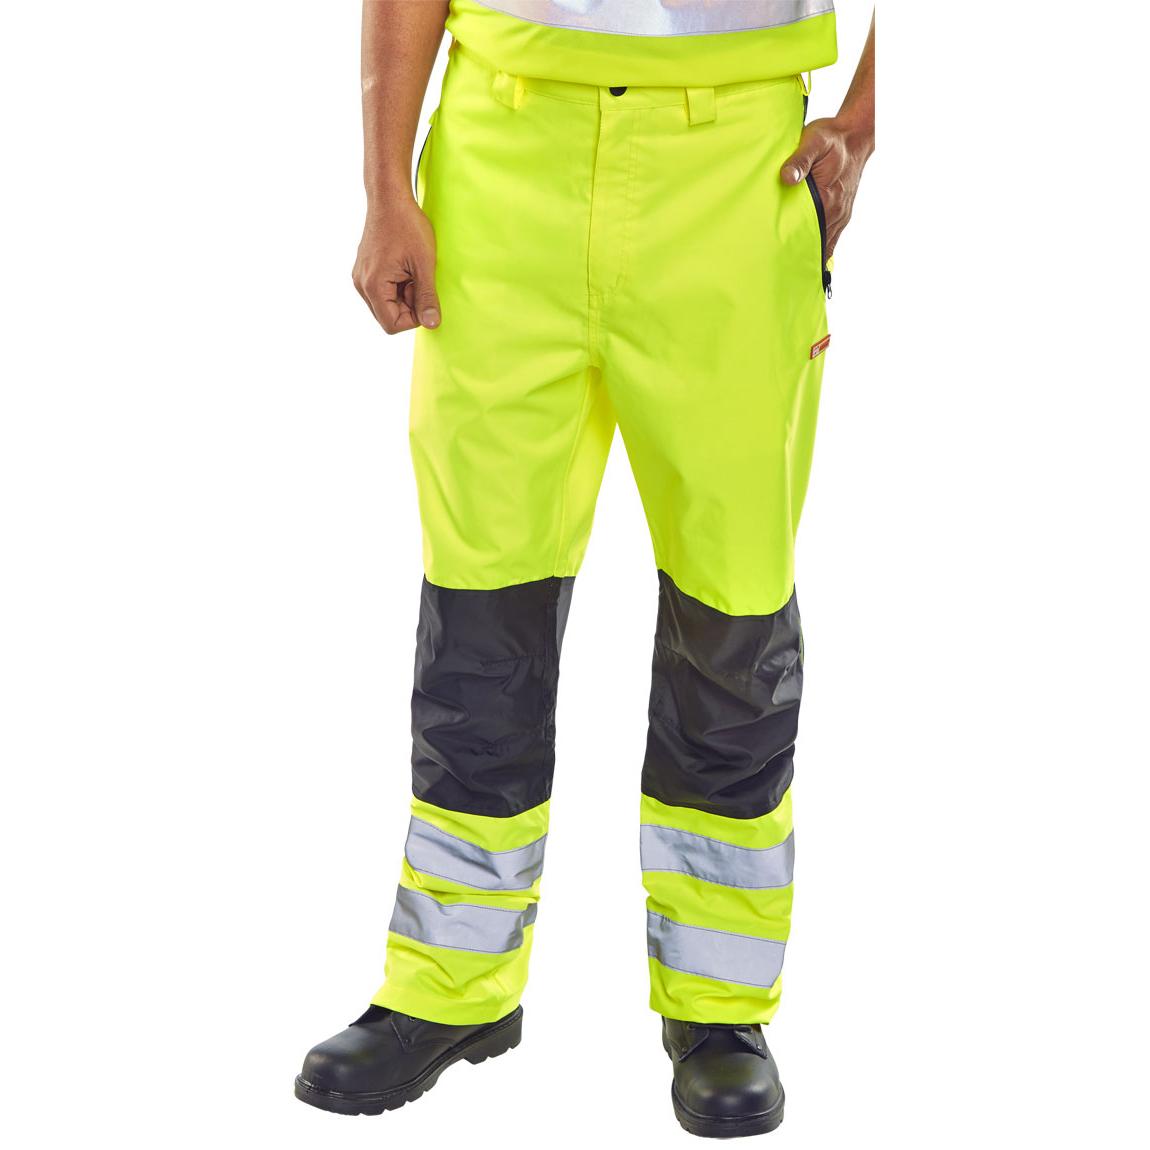 Ladies B-Seen Contrast Trousers Hi-Vis Waterproof M Saturn Yellow Ref BD85SYM *Up to 3 Day Leadtime*